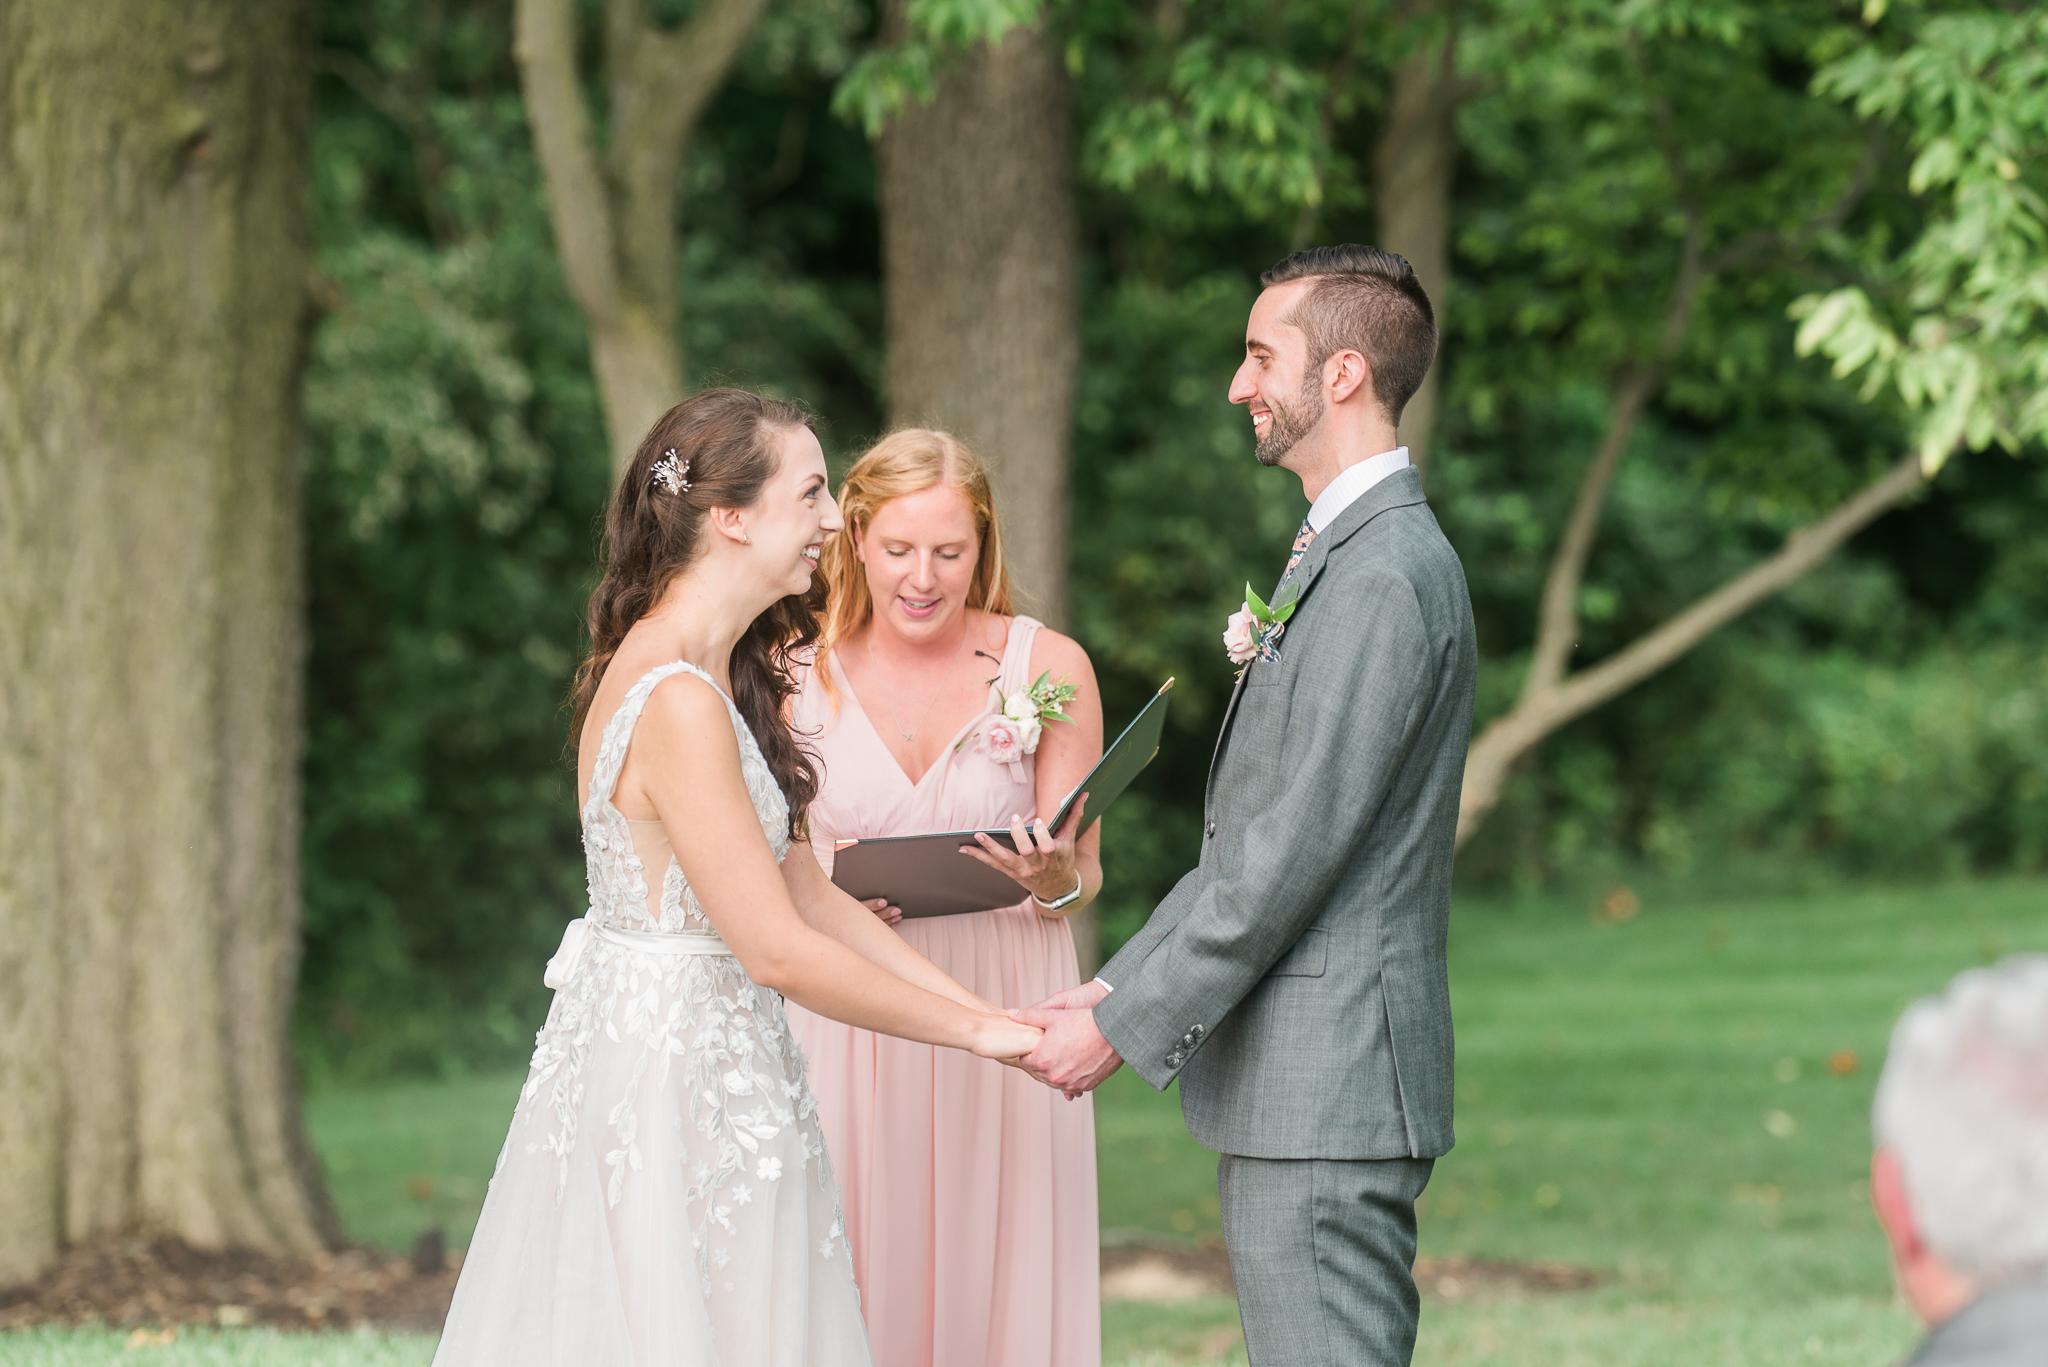 Sycamore at Mallow Run Wedding7436.jpg